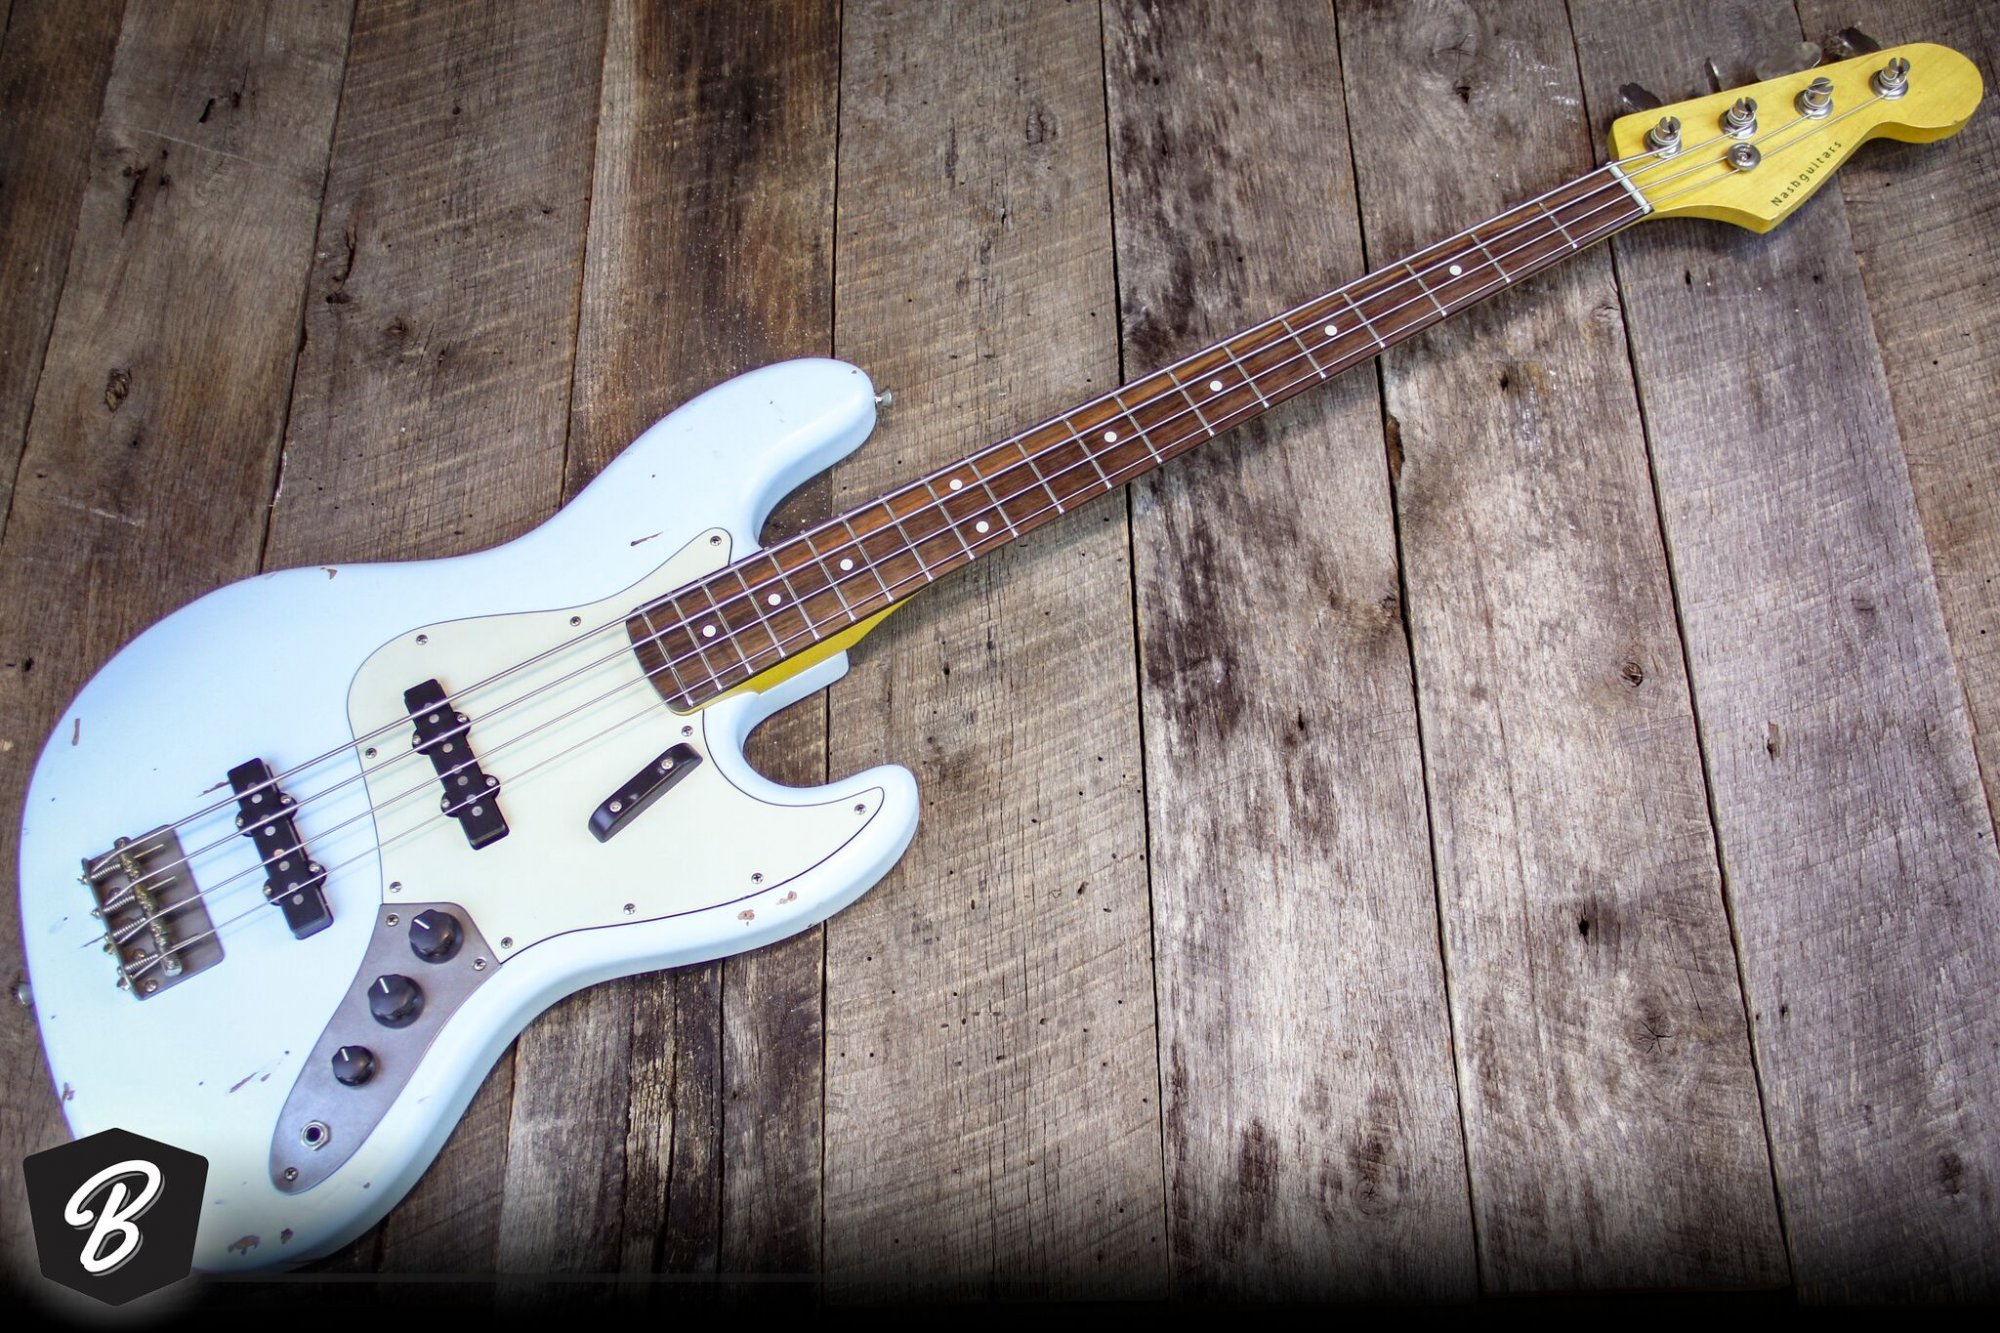 Nash JB63 Bass in Sonic Blue Alder Body